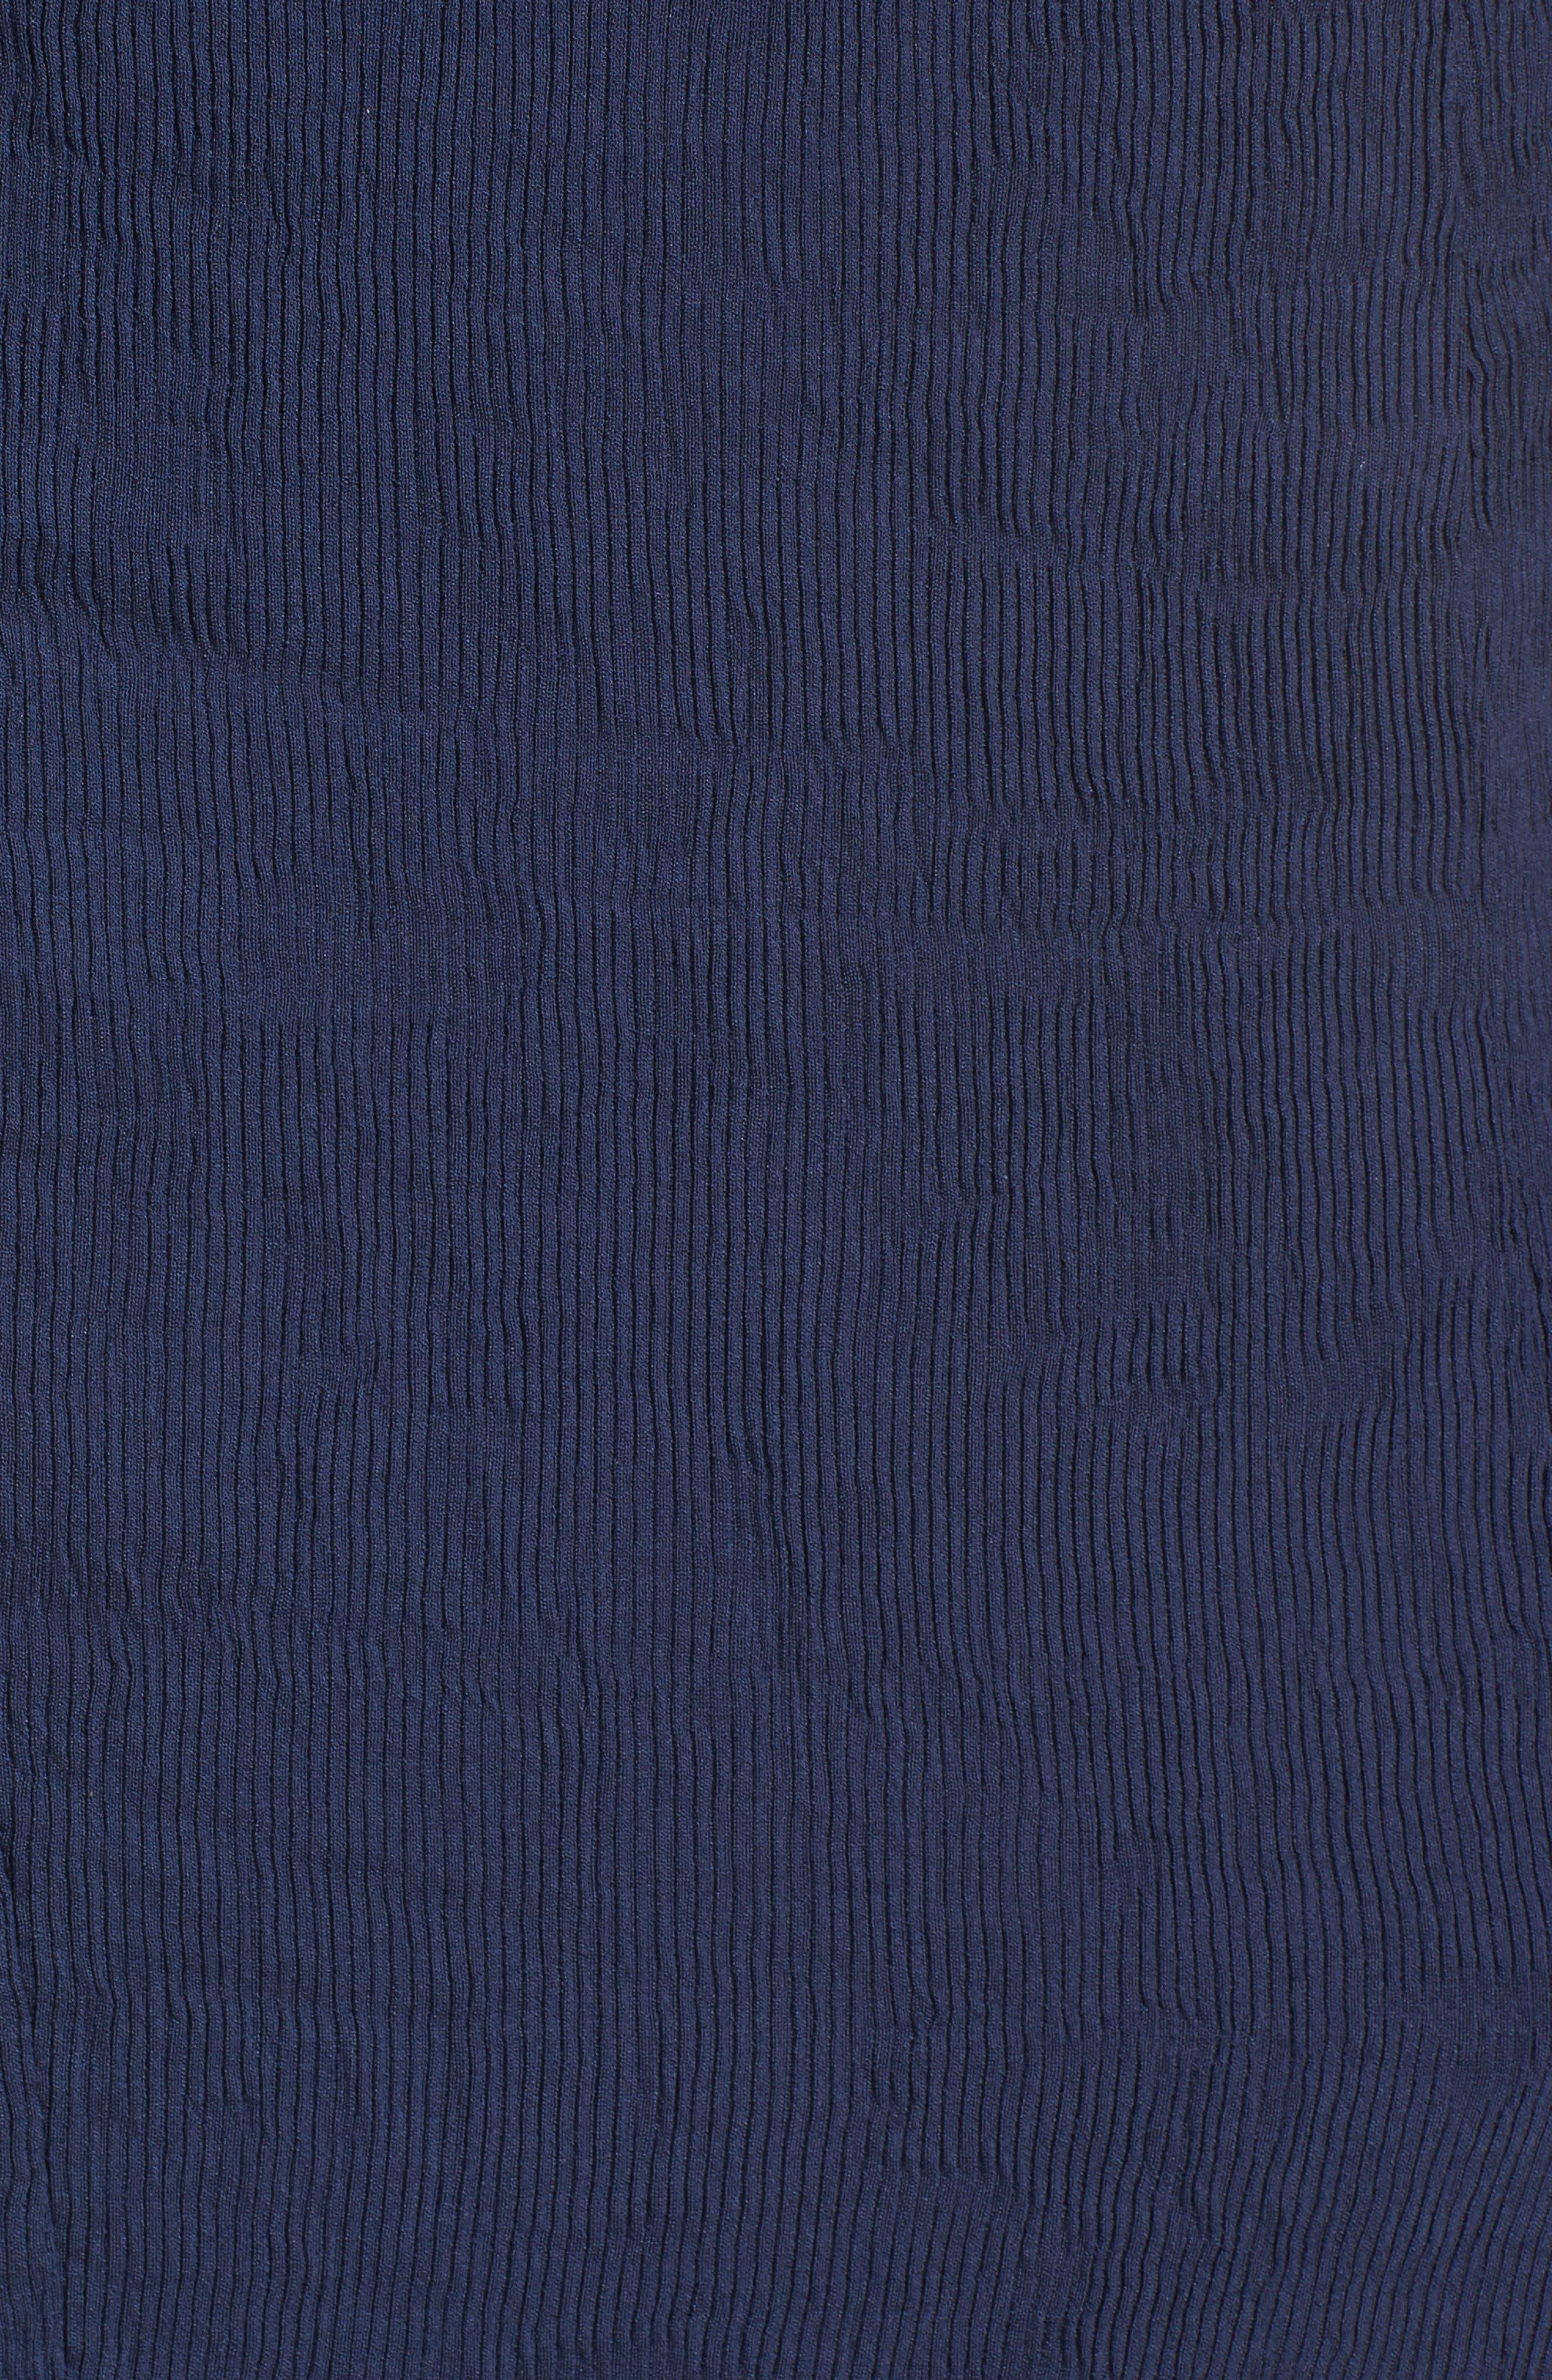 Acacia Off the Shoulder Dress,                             Alternate thumbnail 5, color,                             400